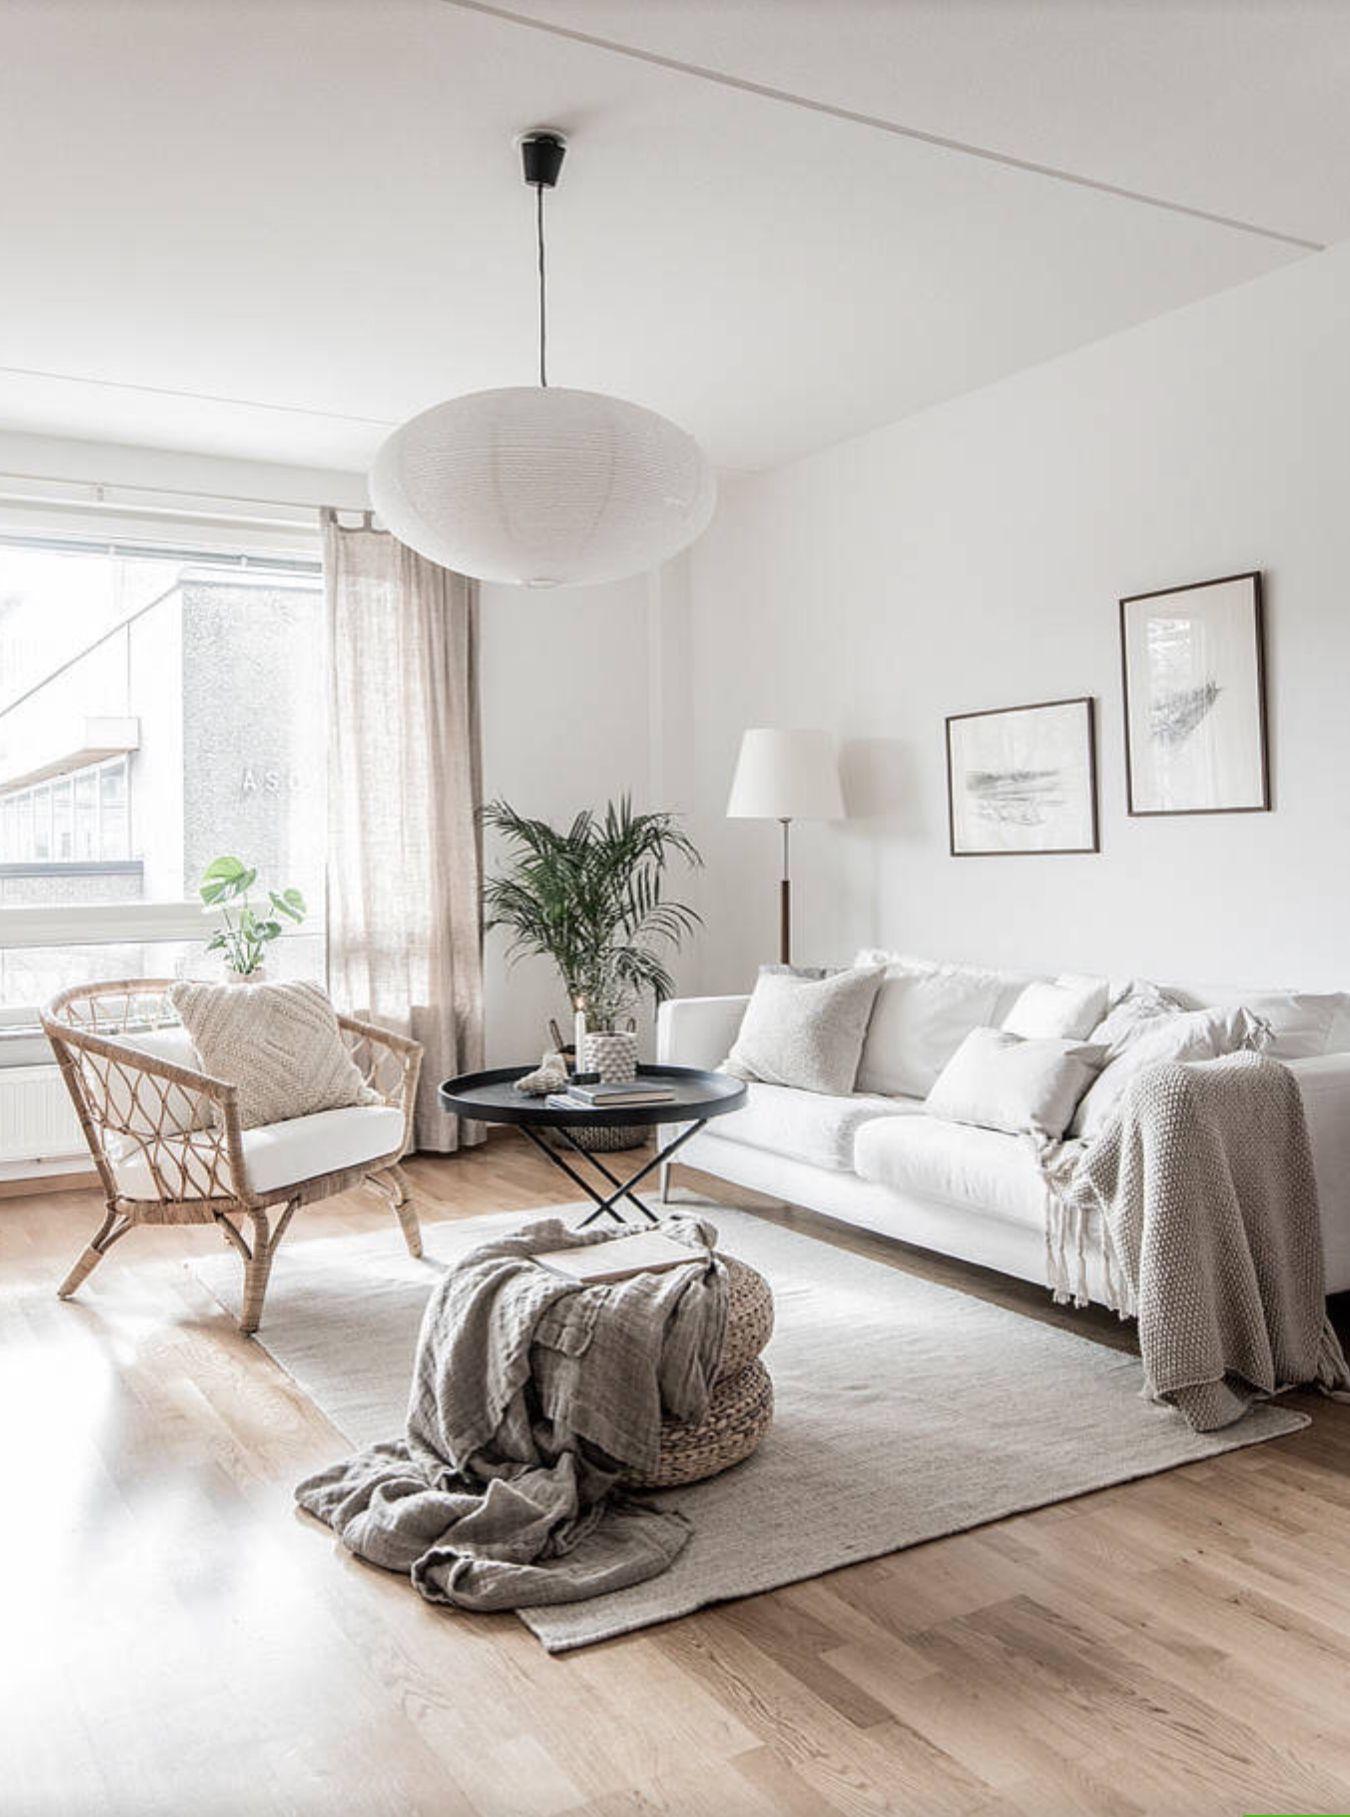 27 rustic farmhouse living room decor ideas for your home on home interior design ideas id=96060